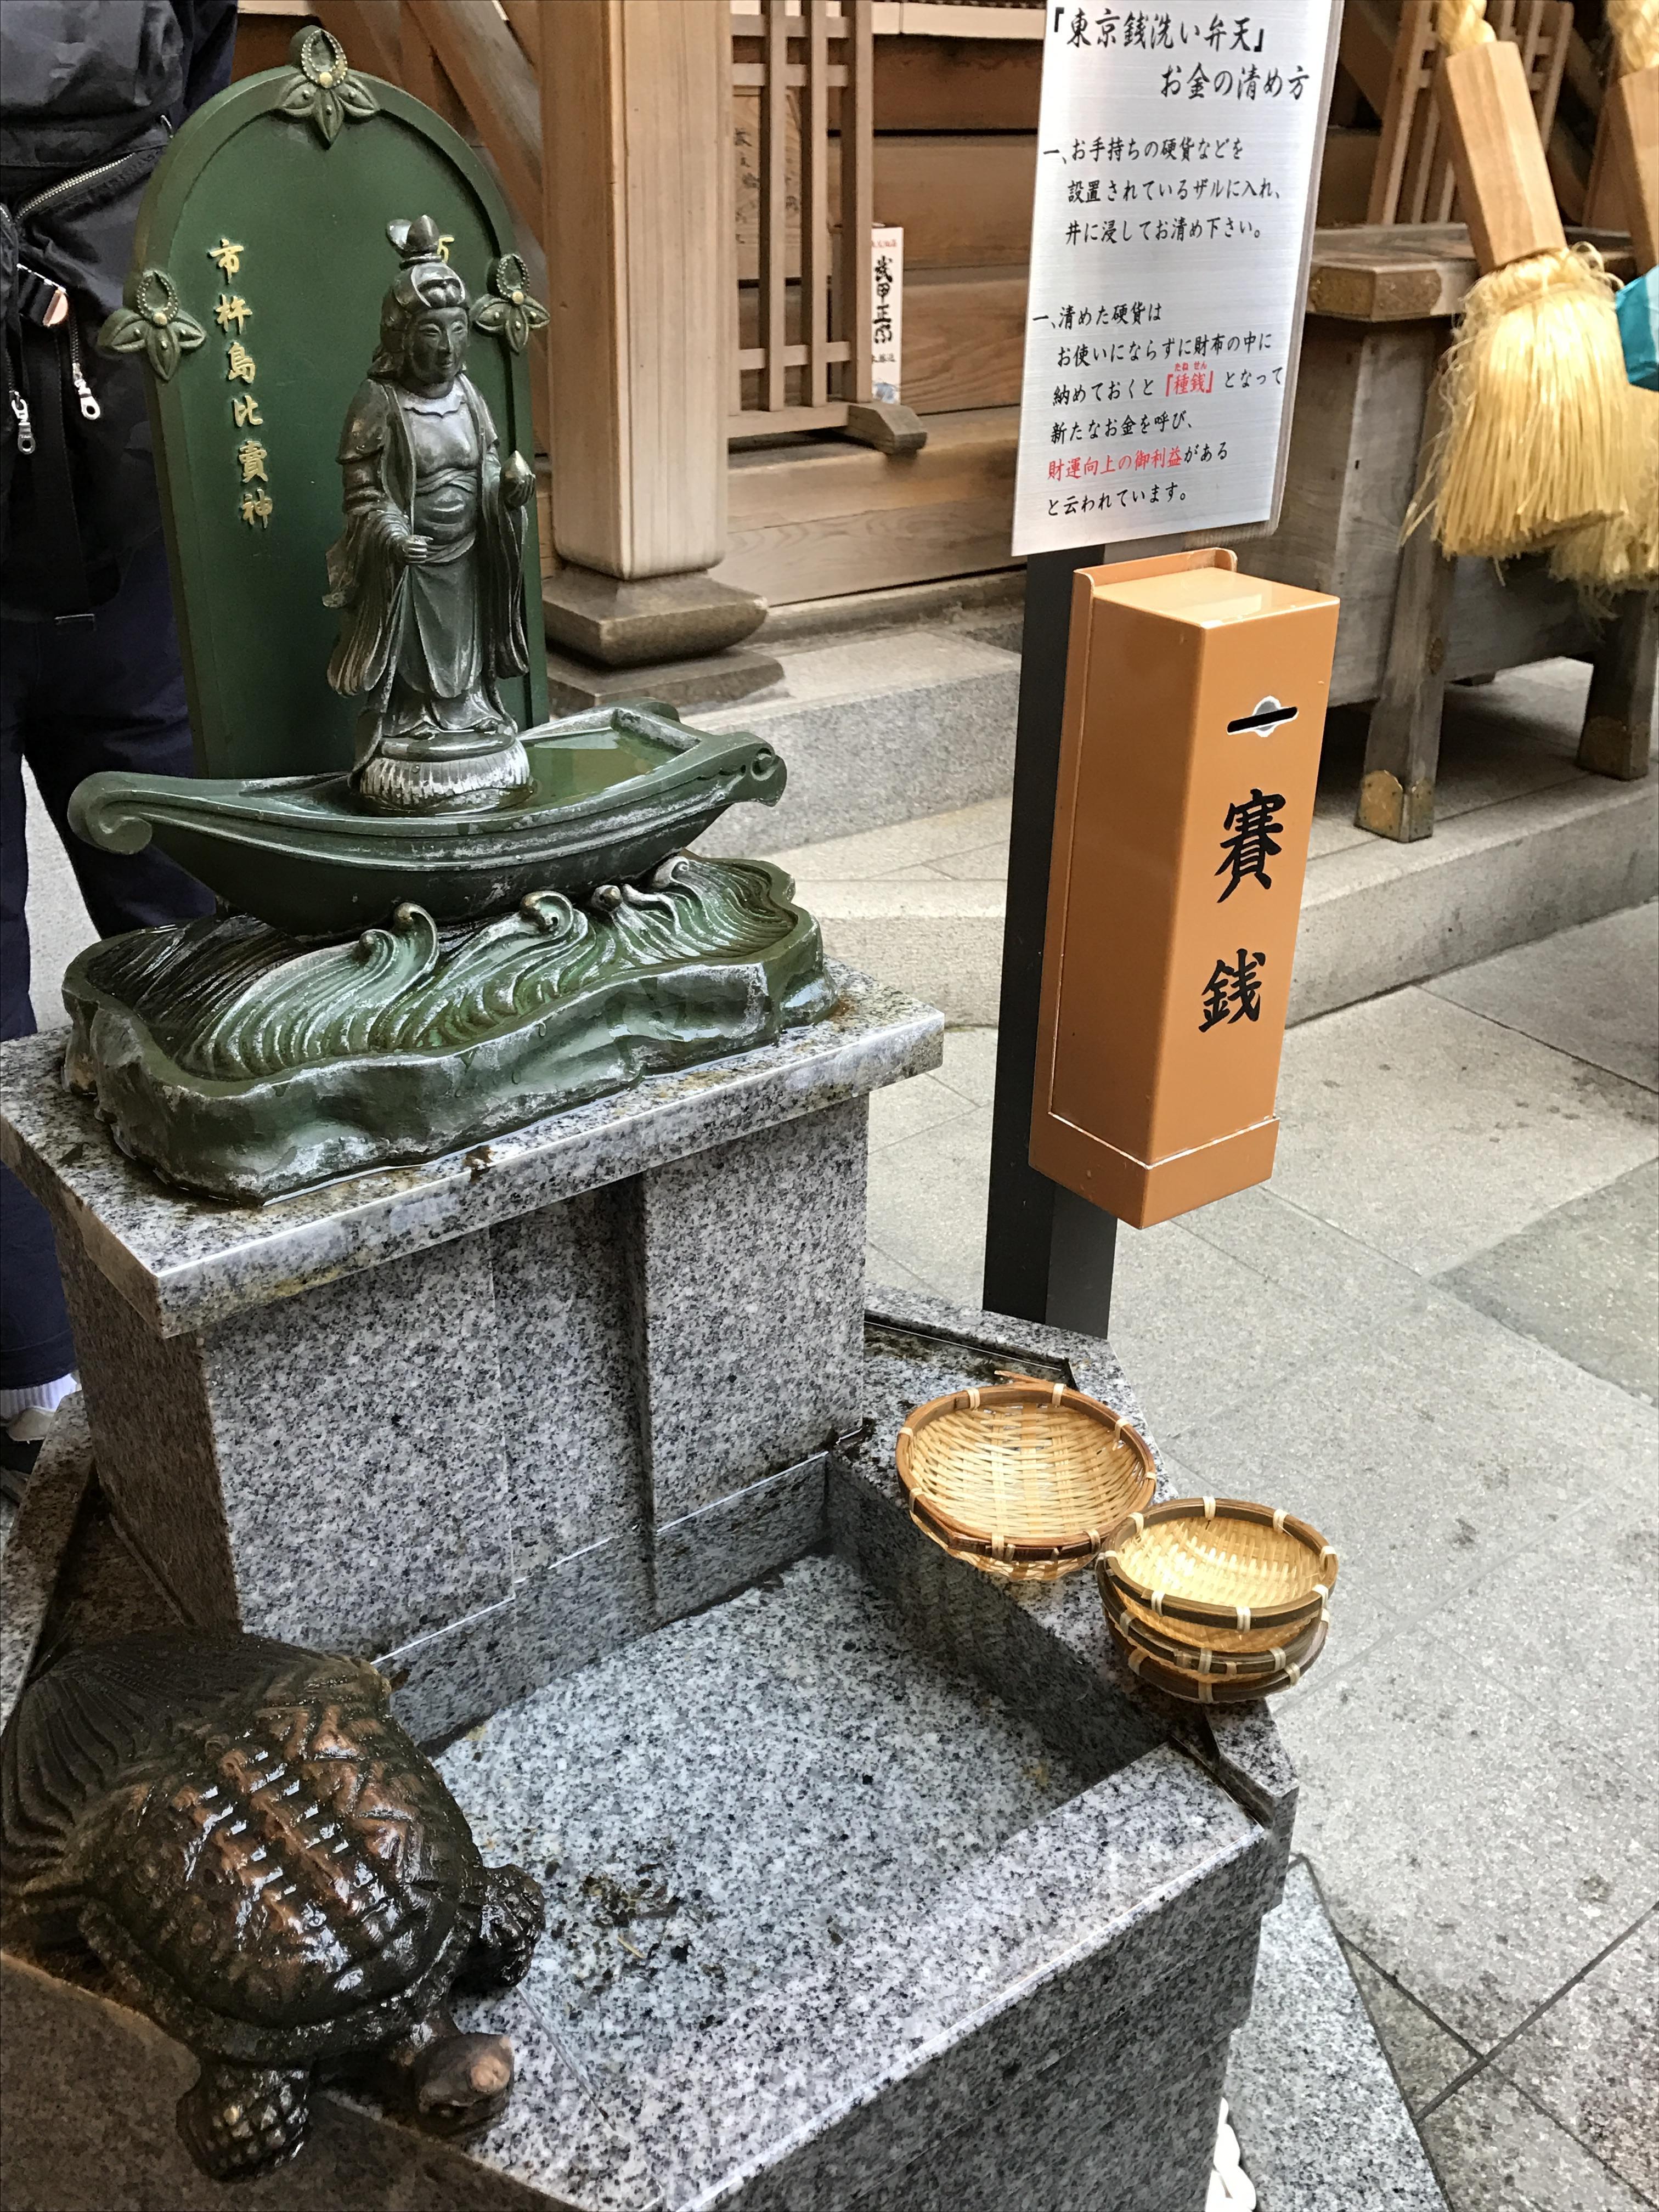 Correspondent of lesser omentum Shinto shrine Sarasvati big